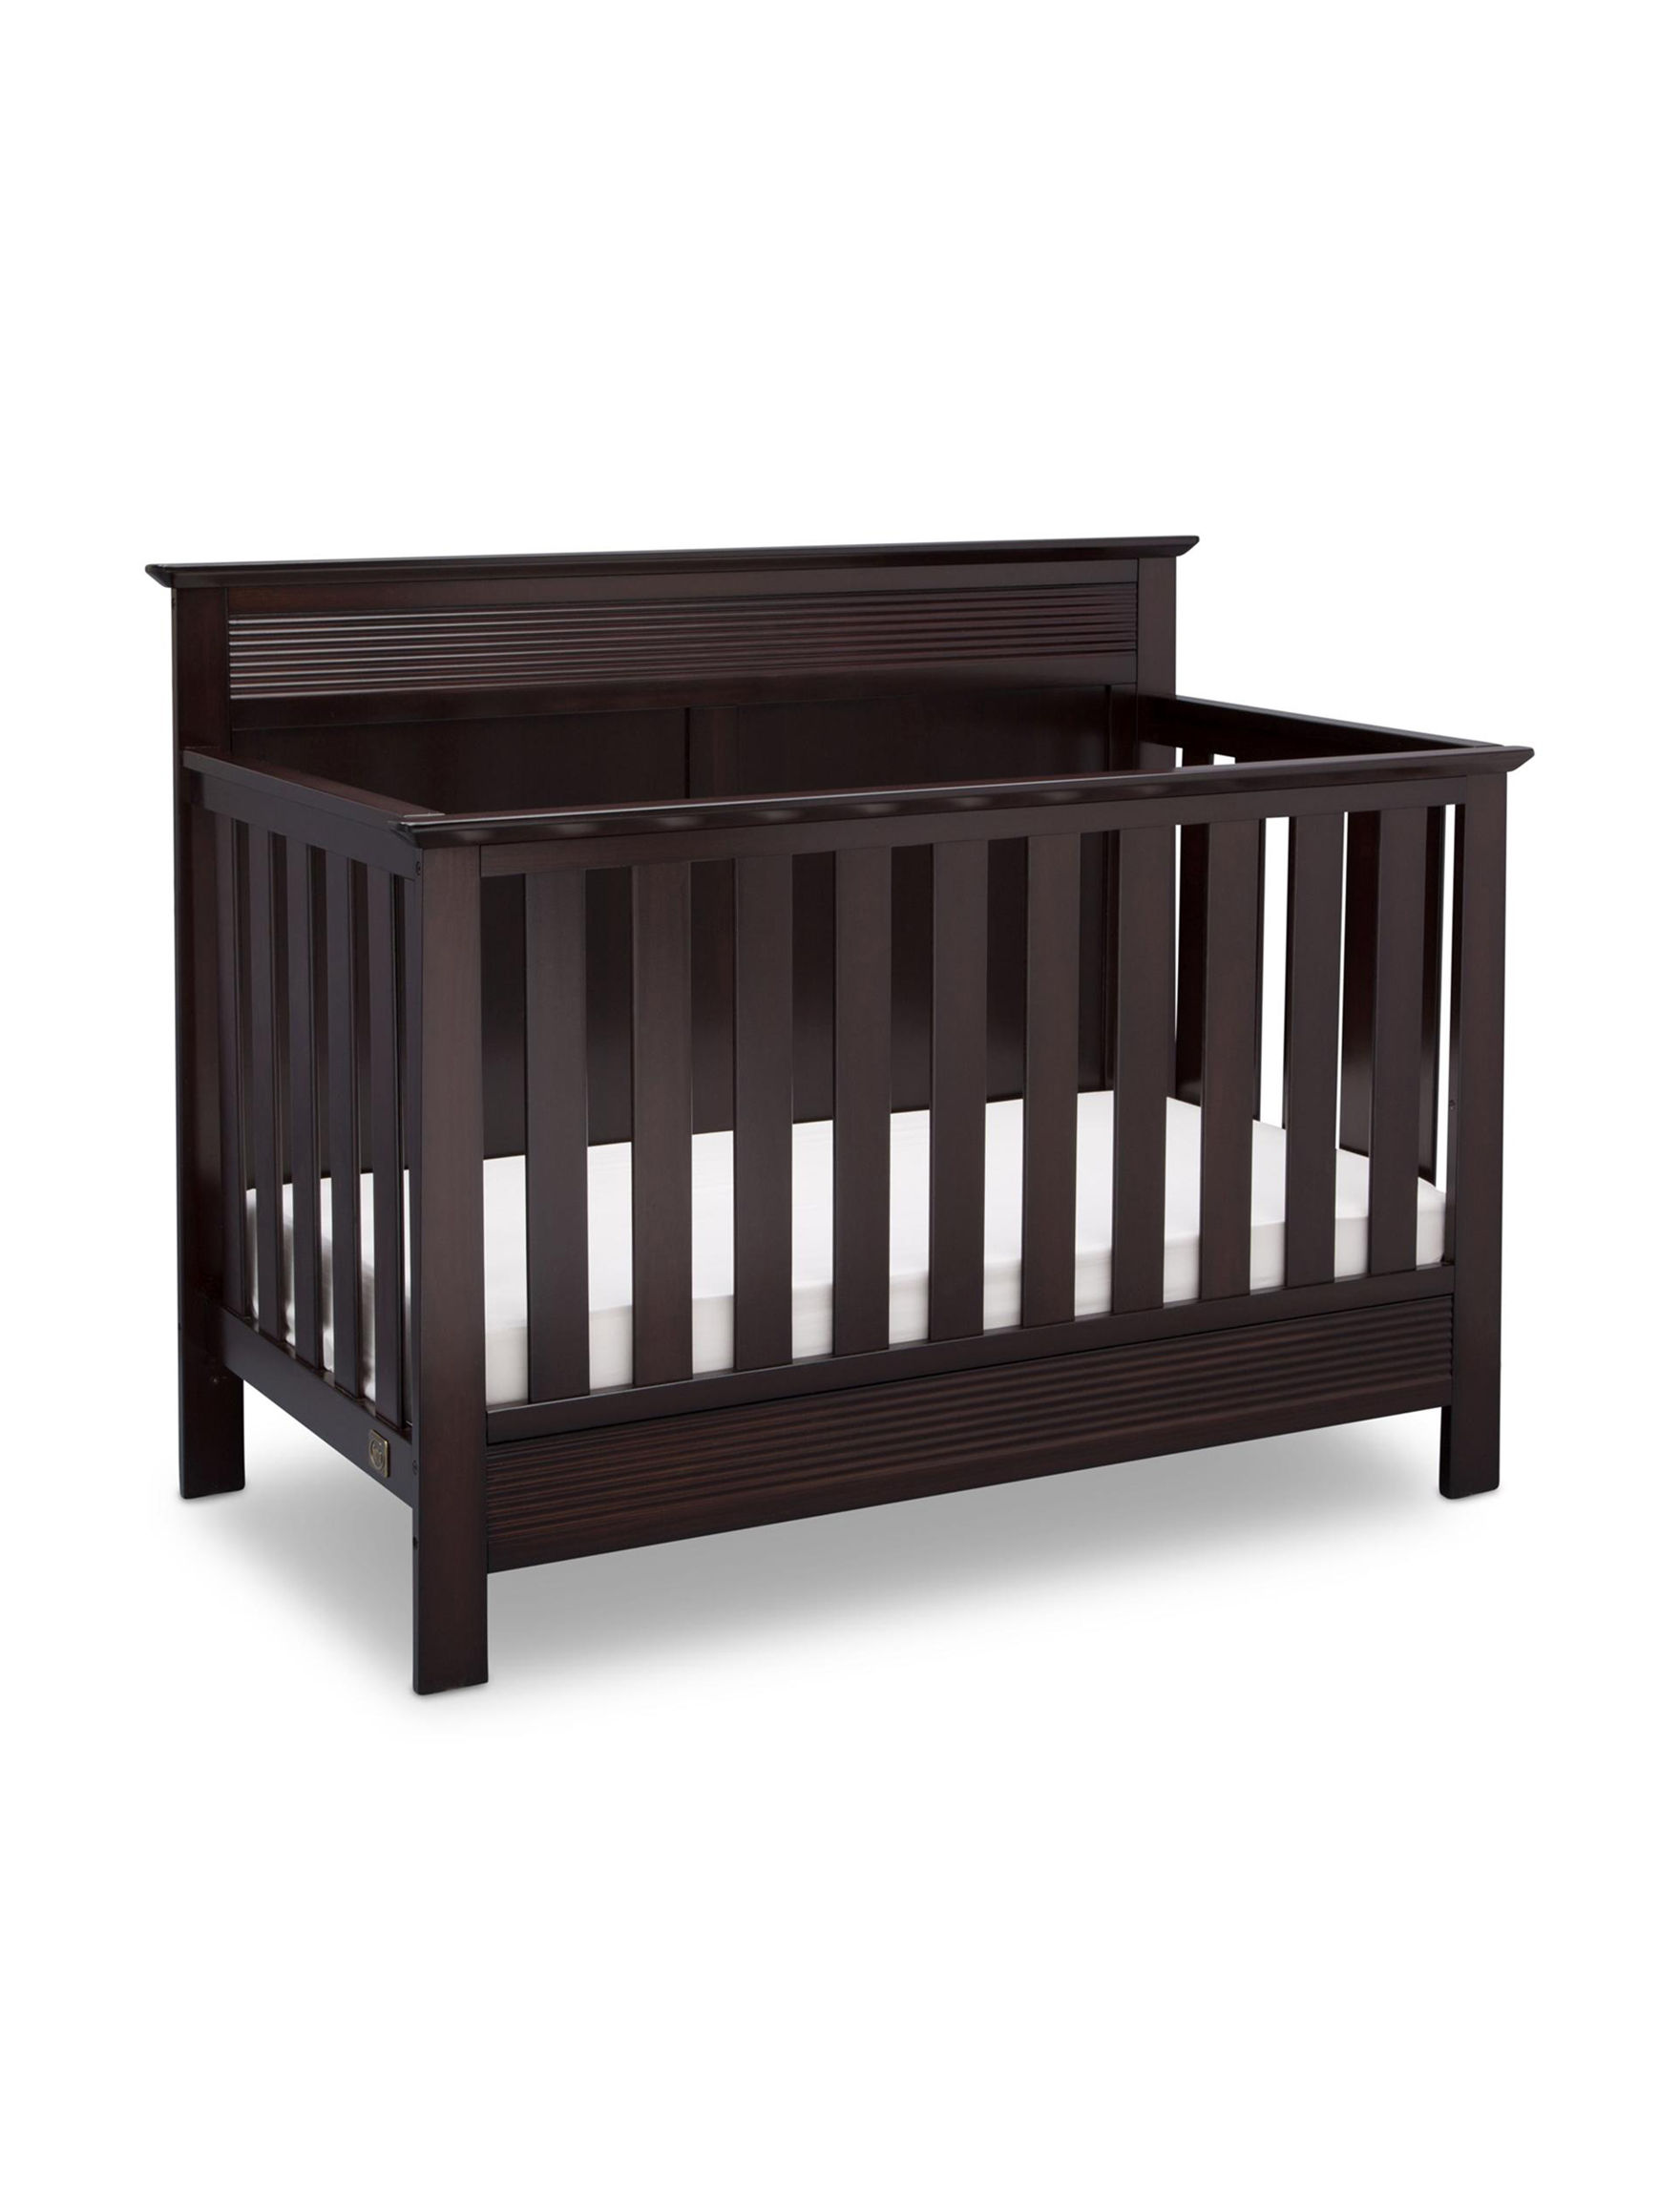 Serta Dark Chocolate Cribs Bedroom Furniture